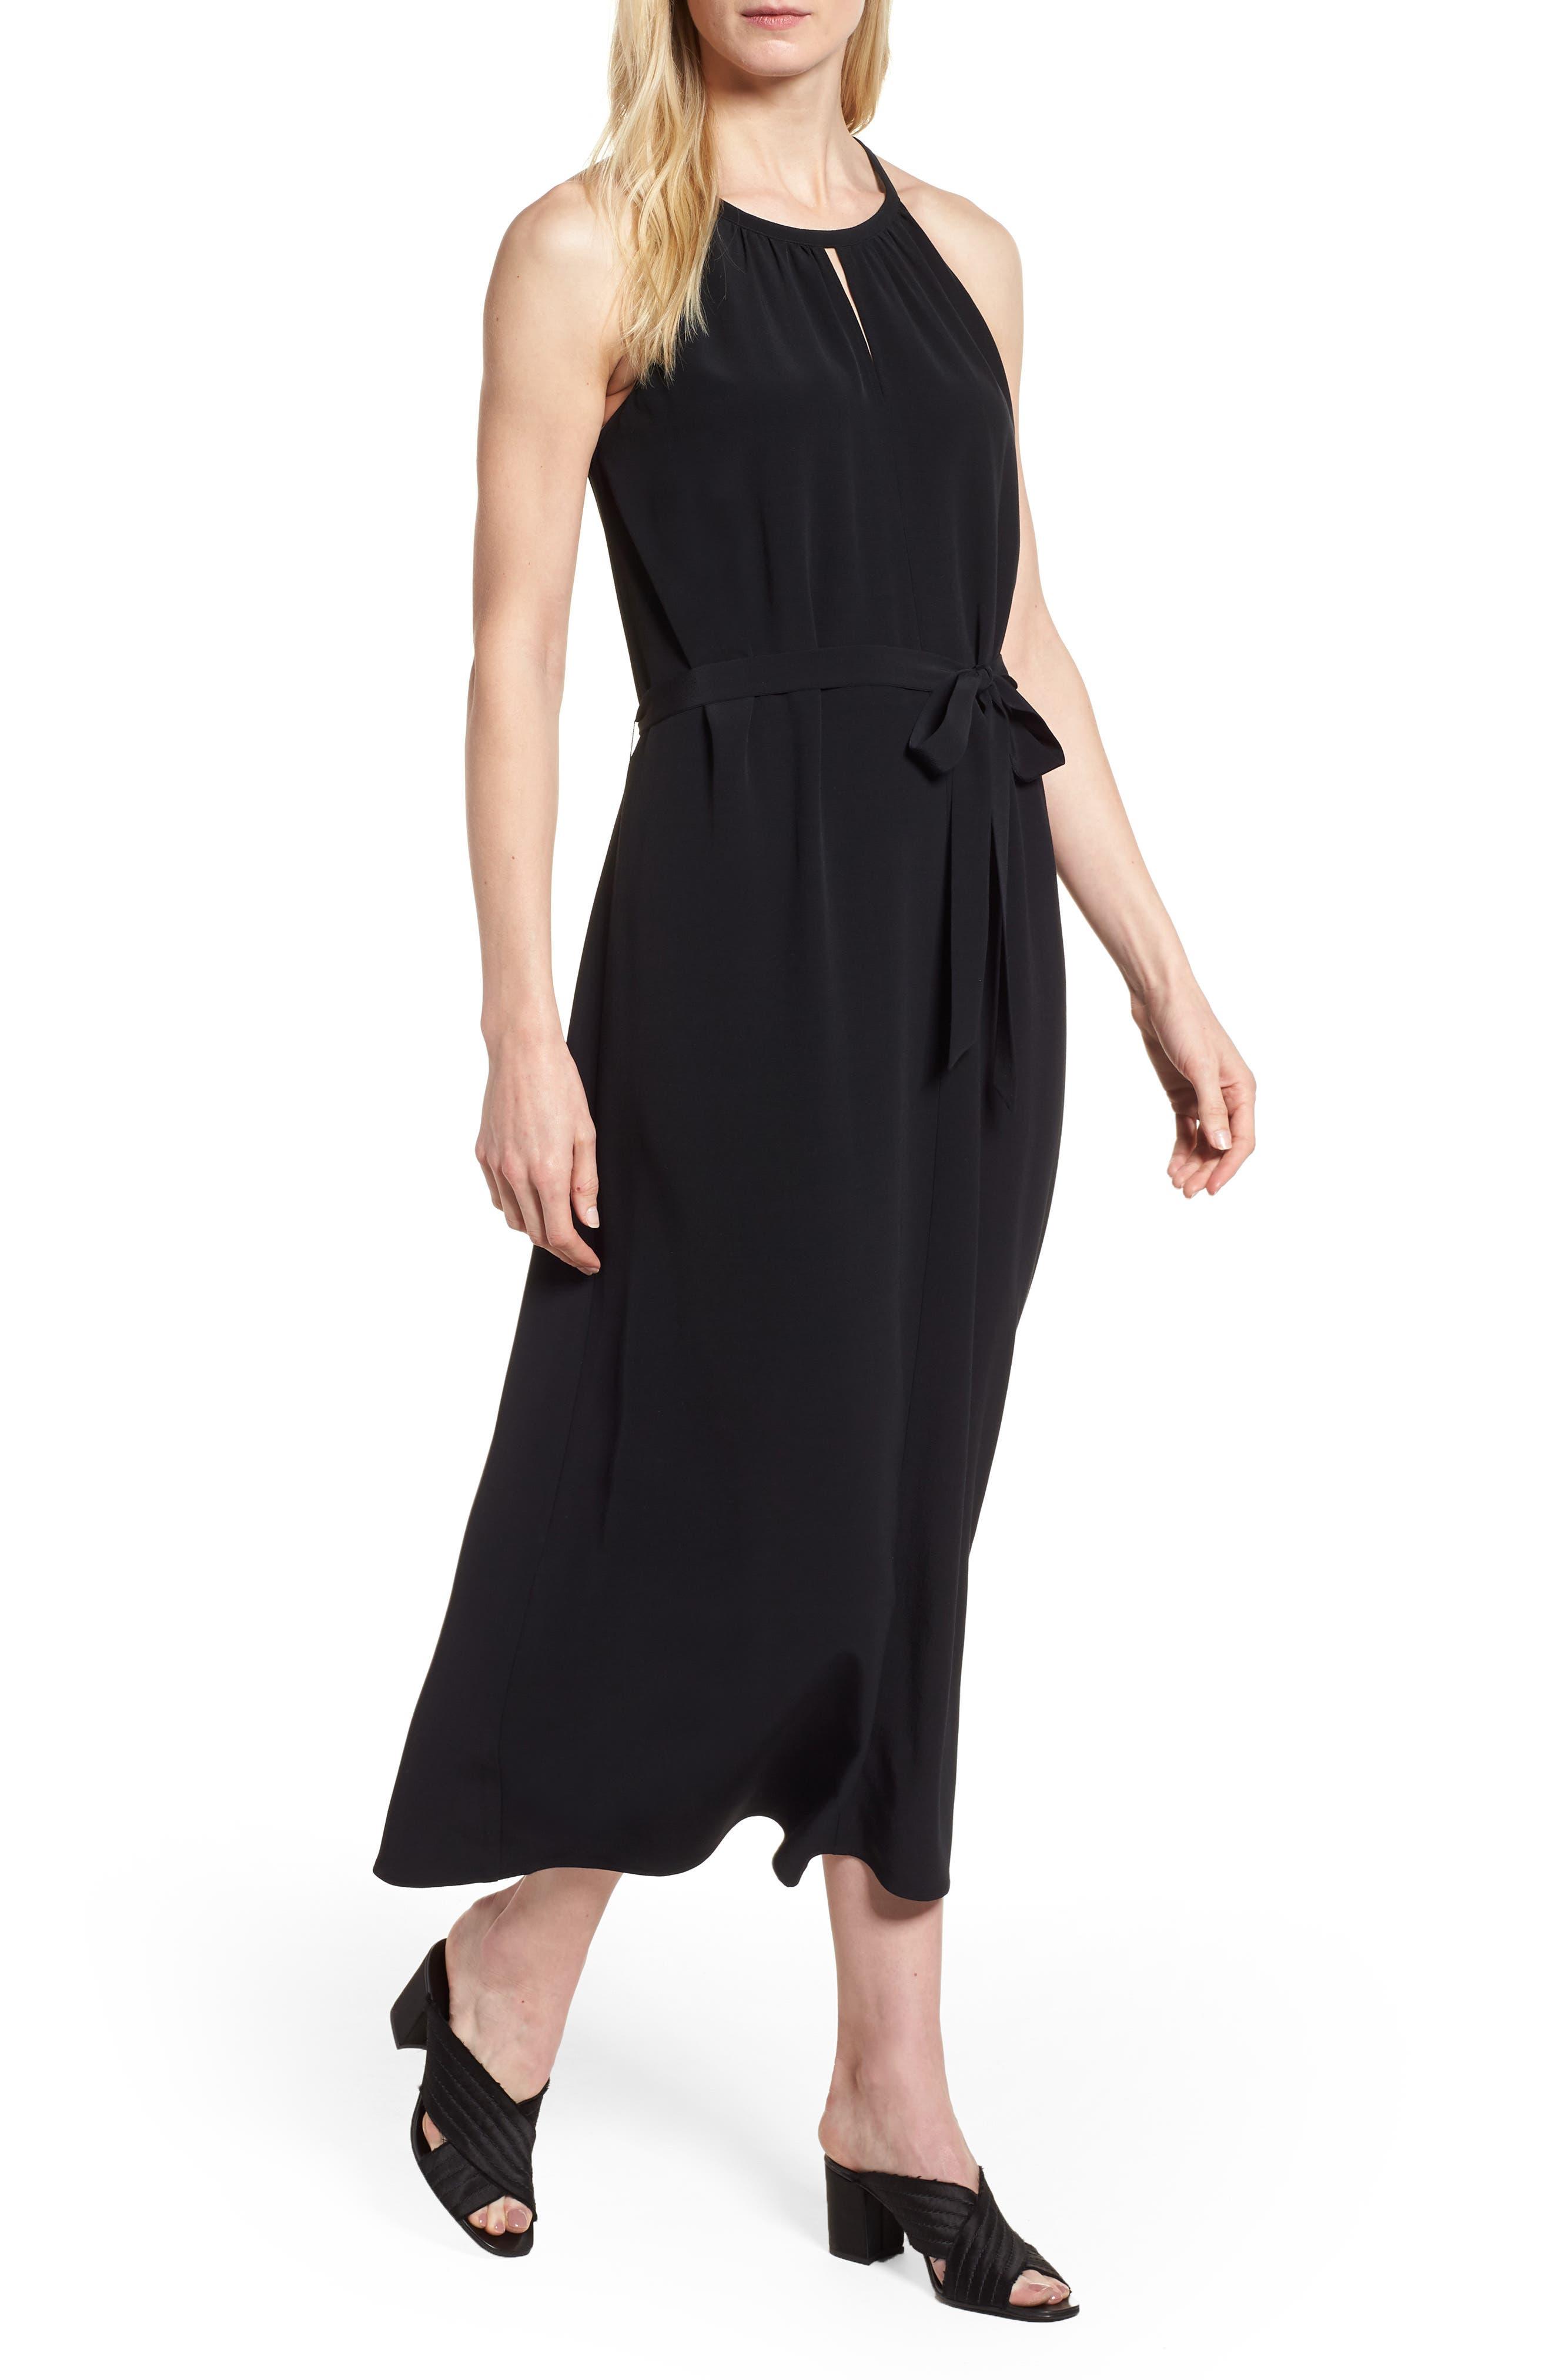 Tencel<sup>®</sup> Lyocell Blend Midi Dress,                             Main thumbnail 1, color,                             001